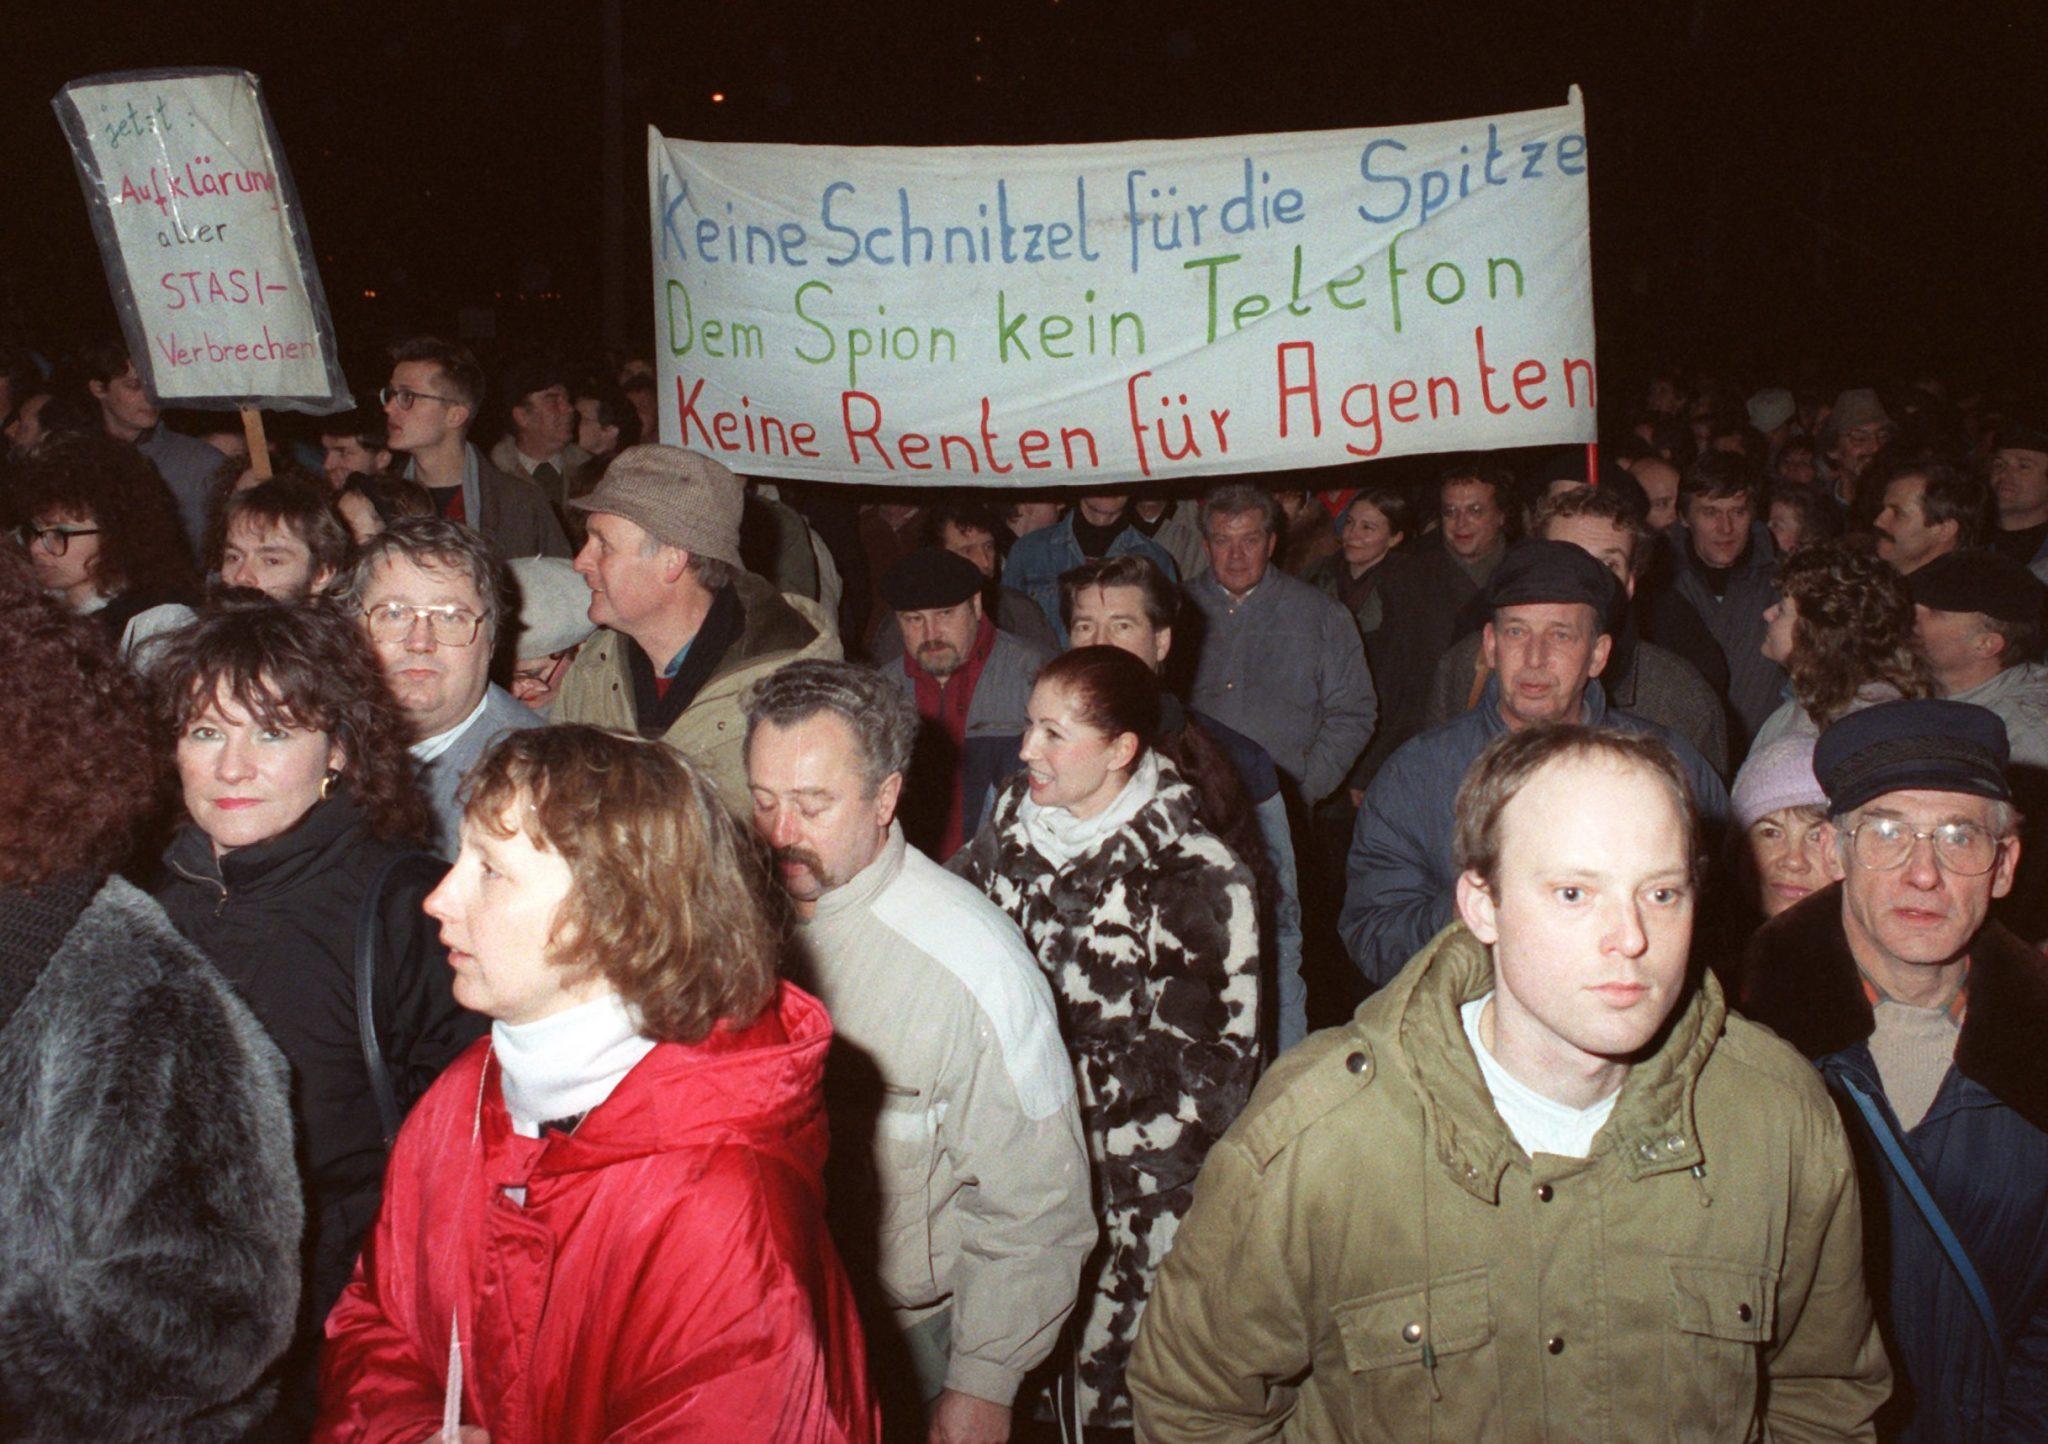 Stasi-Zentrale